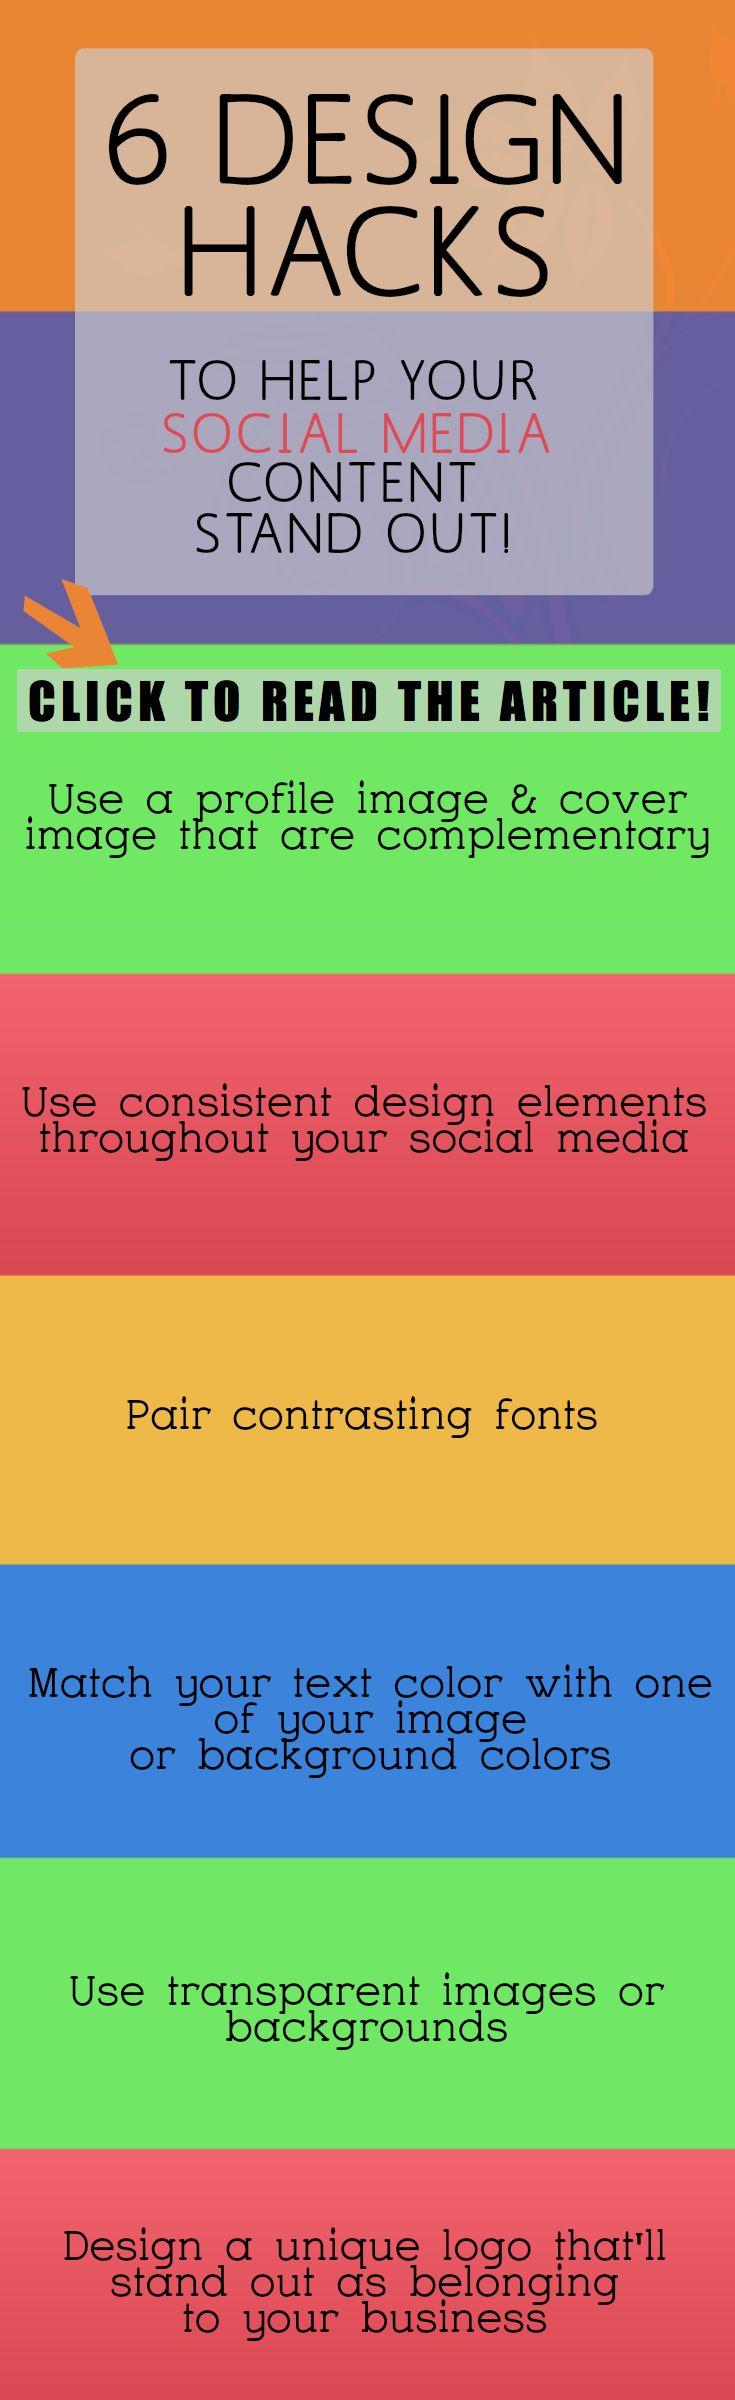 Logosmartz custom logo maker 5 0 review and download - Social Media Design 6 Design Hacks To Help Your Social Content Stand Out